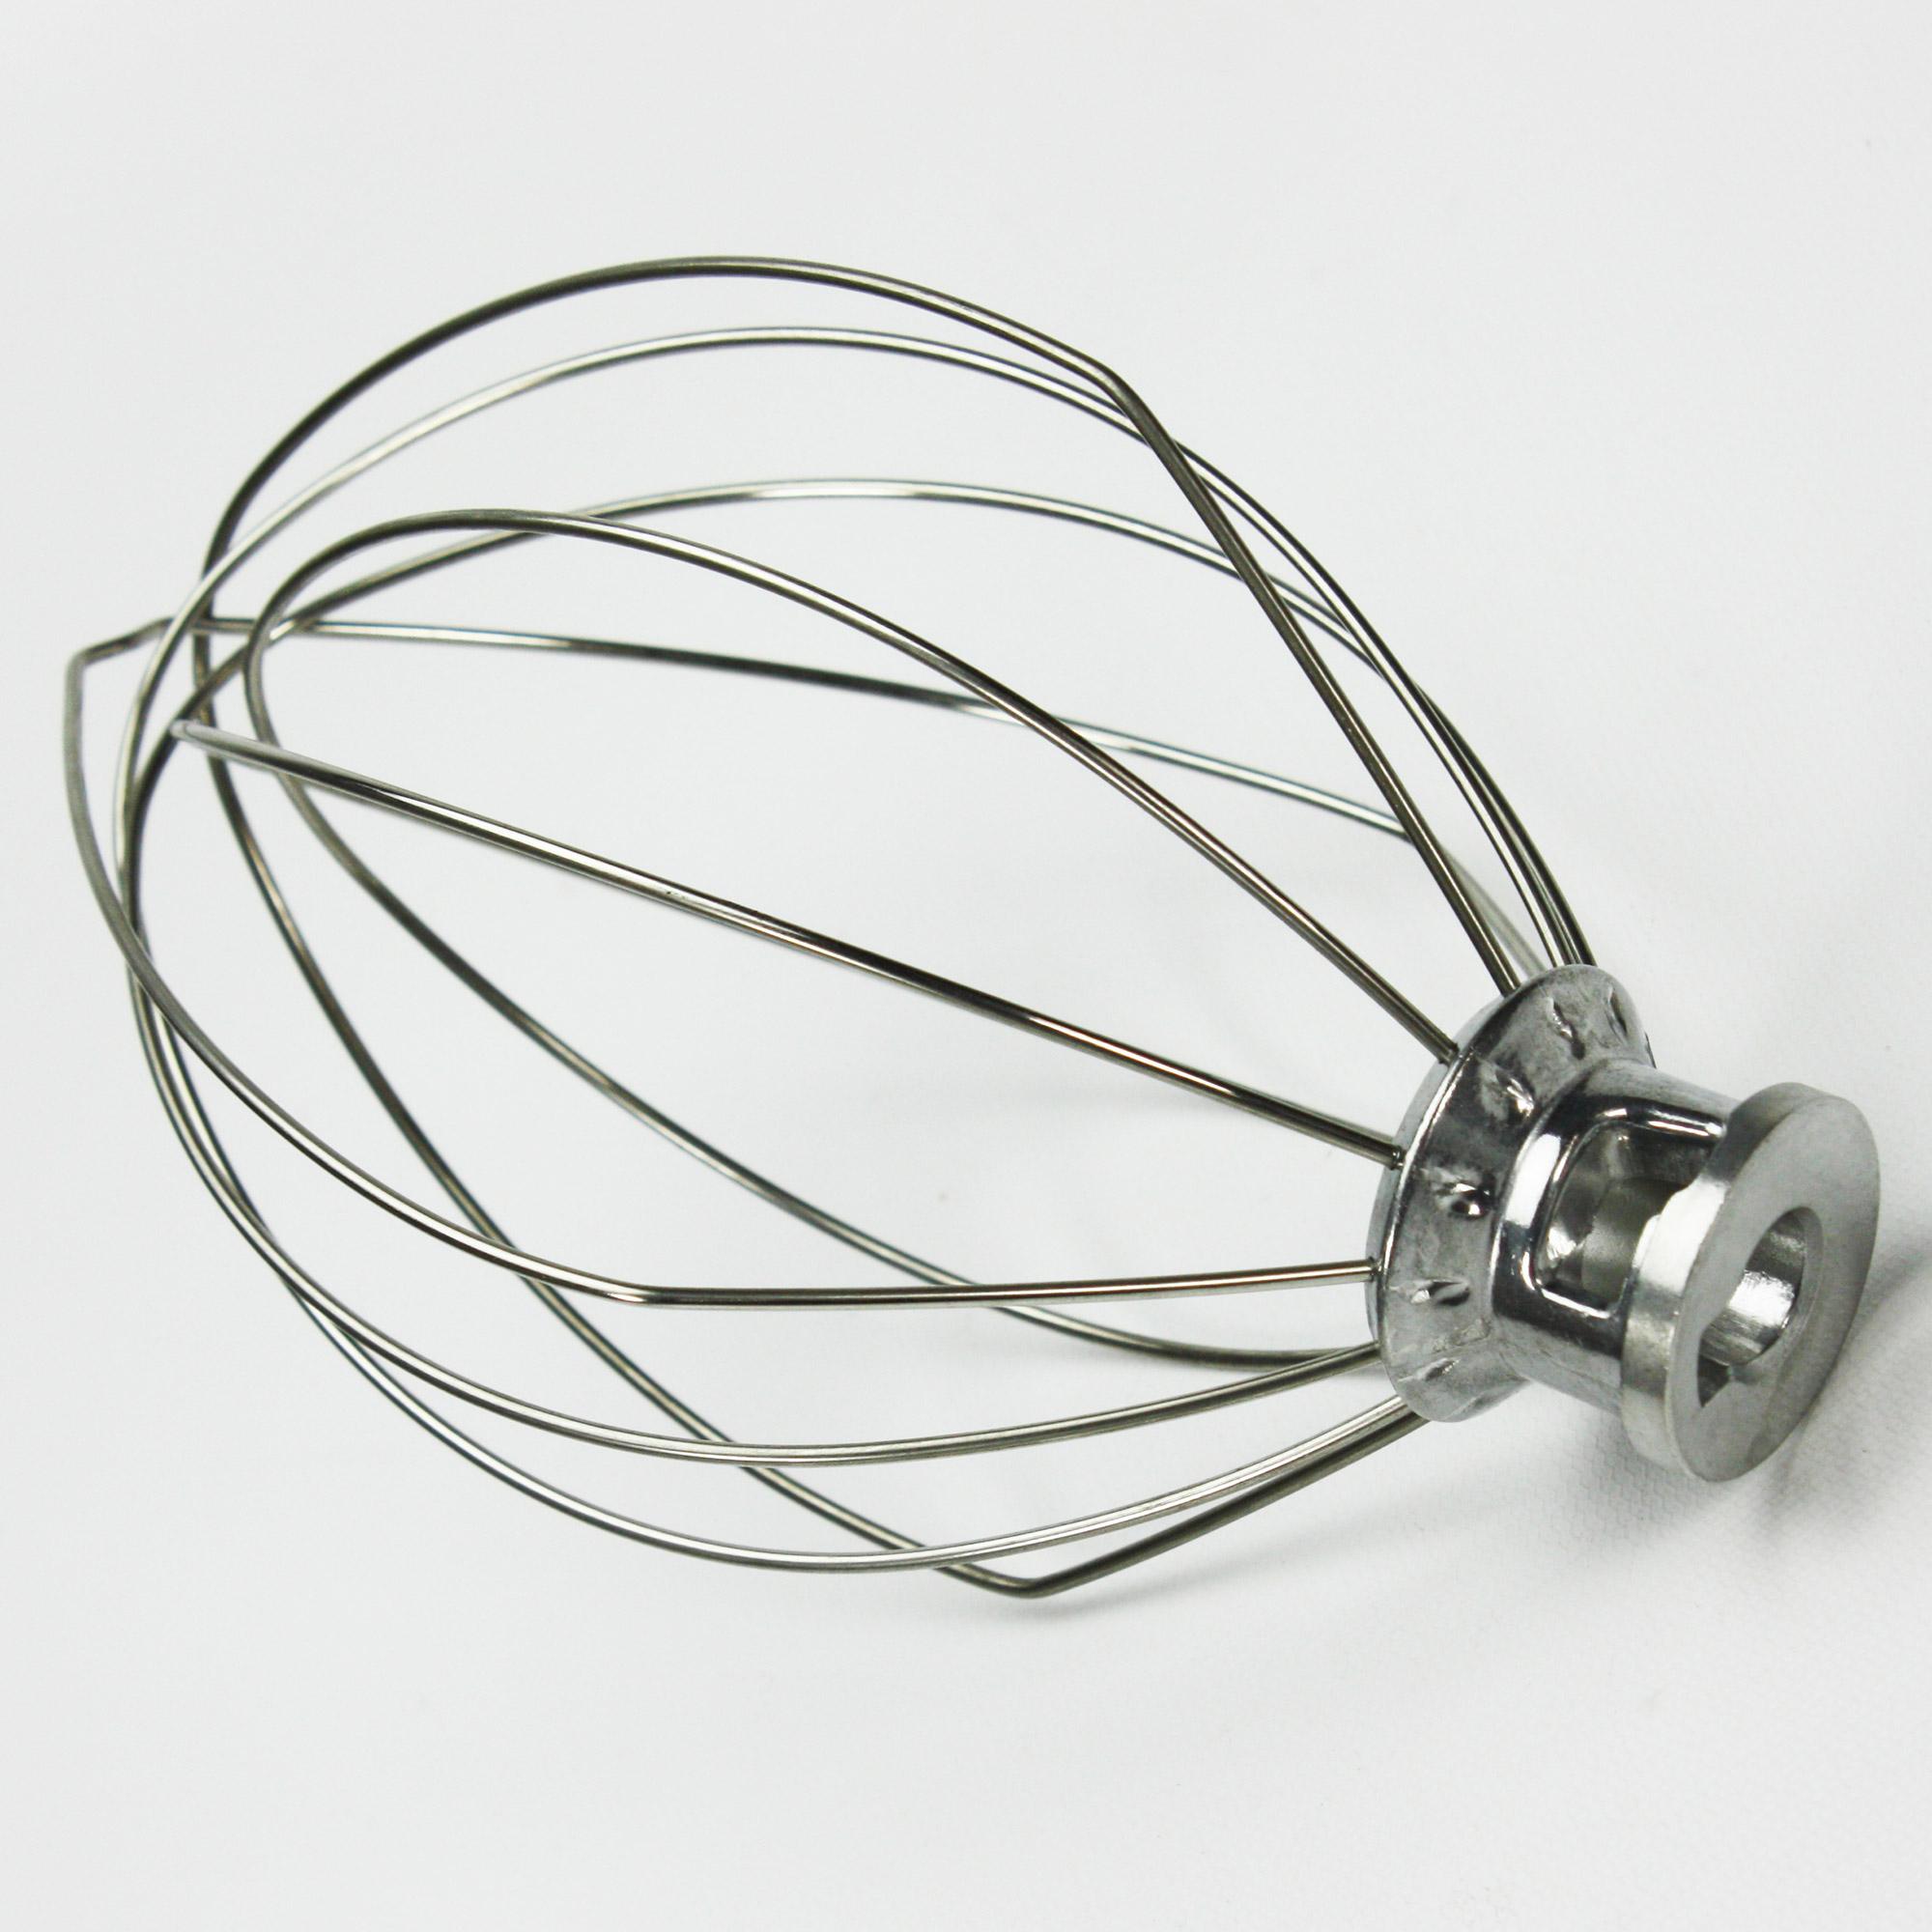 gpsk5aww for k5aww 9704309 kitchen aid mixer wire whip ebay